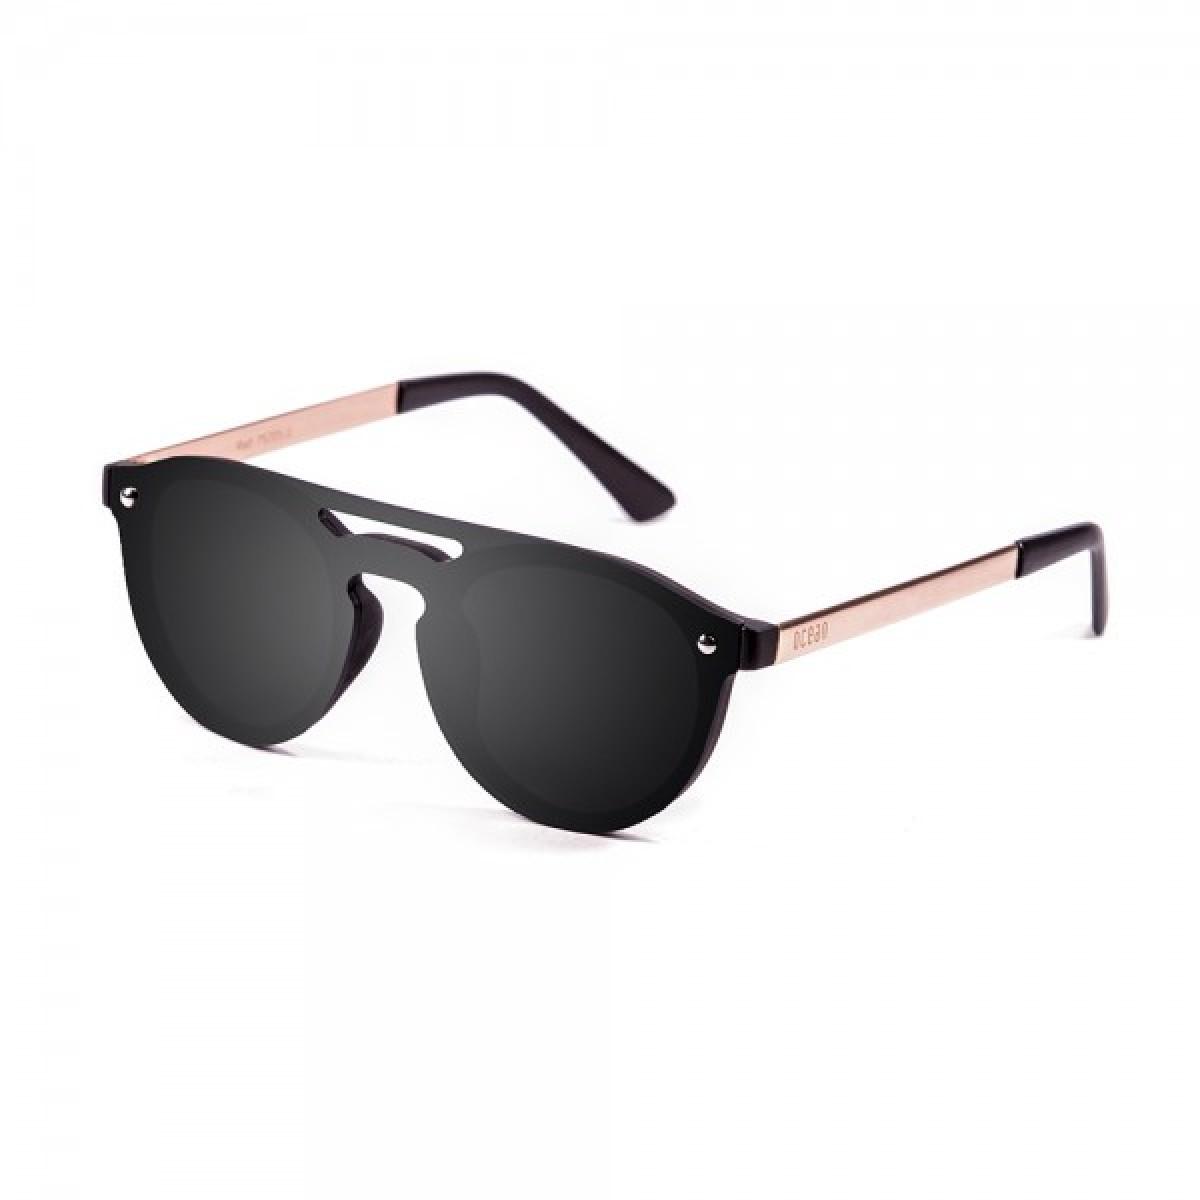 61263b77c67f2 Ocean San Marino Sunglasses (Smoke) - ΑΞΕΣΟΥΑΡ ΡΟΥΧΙΣΜΟΥ